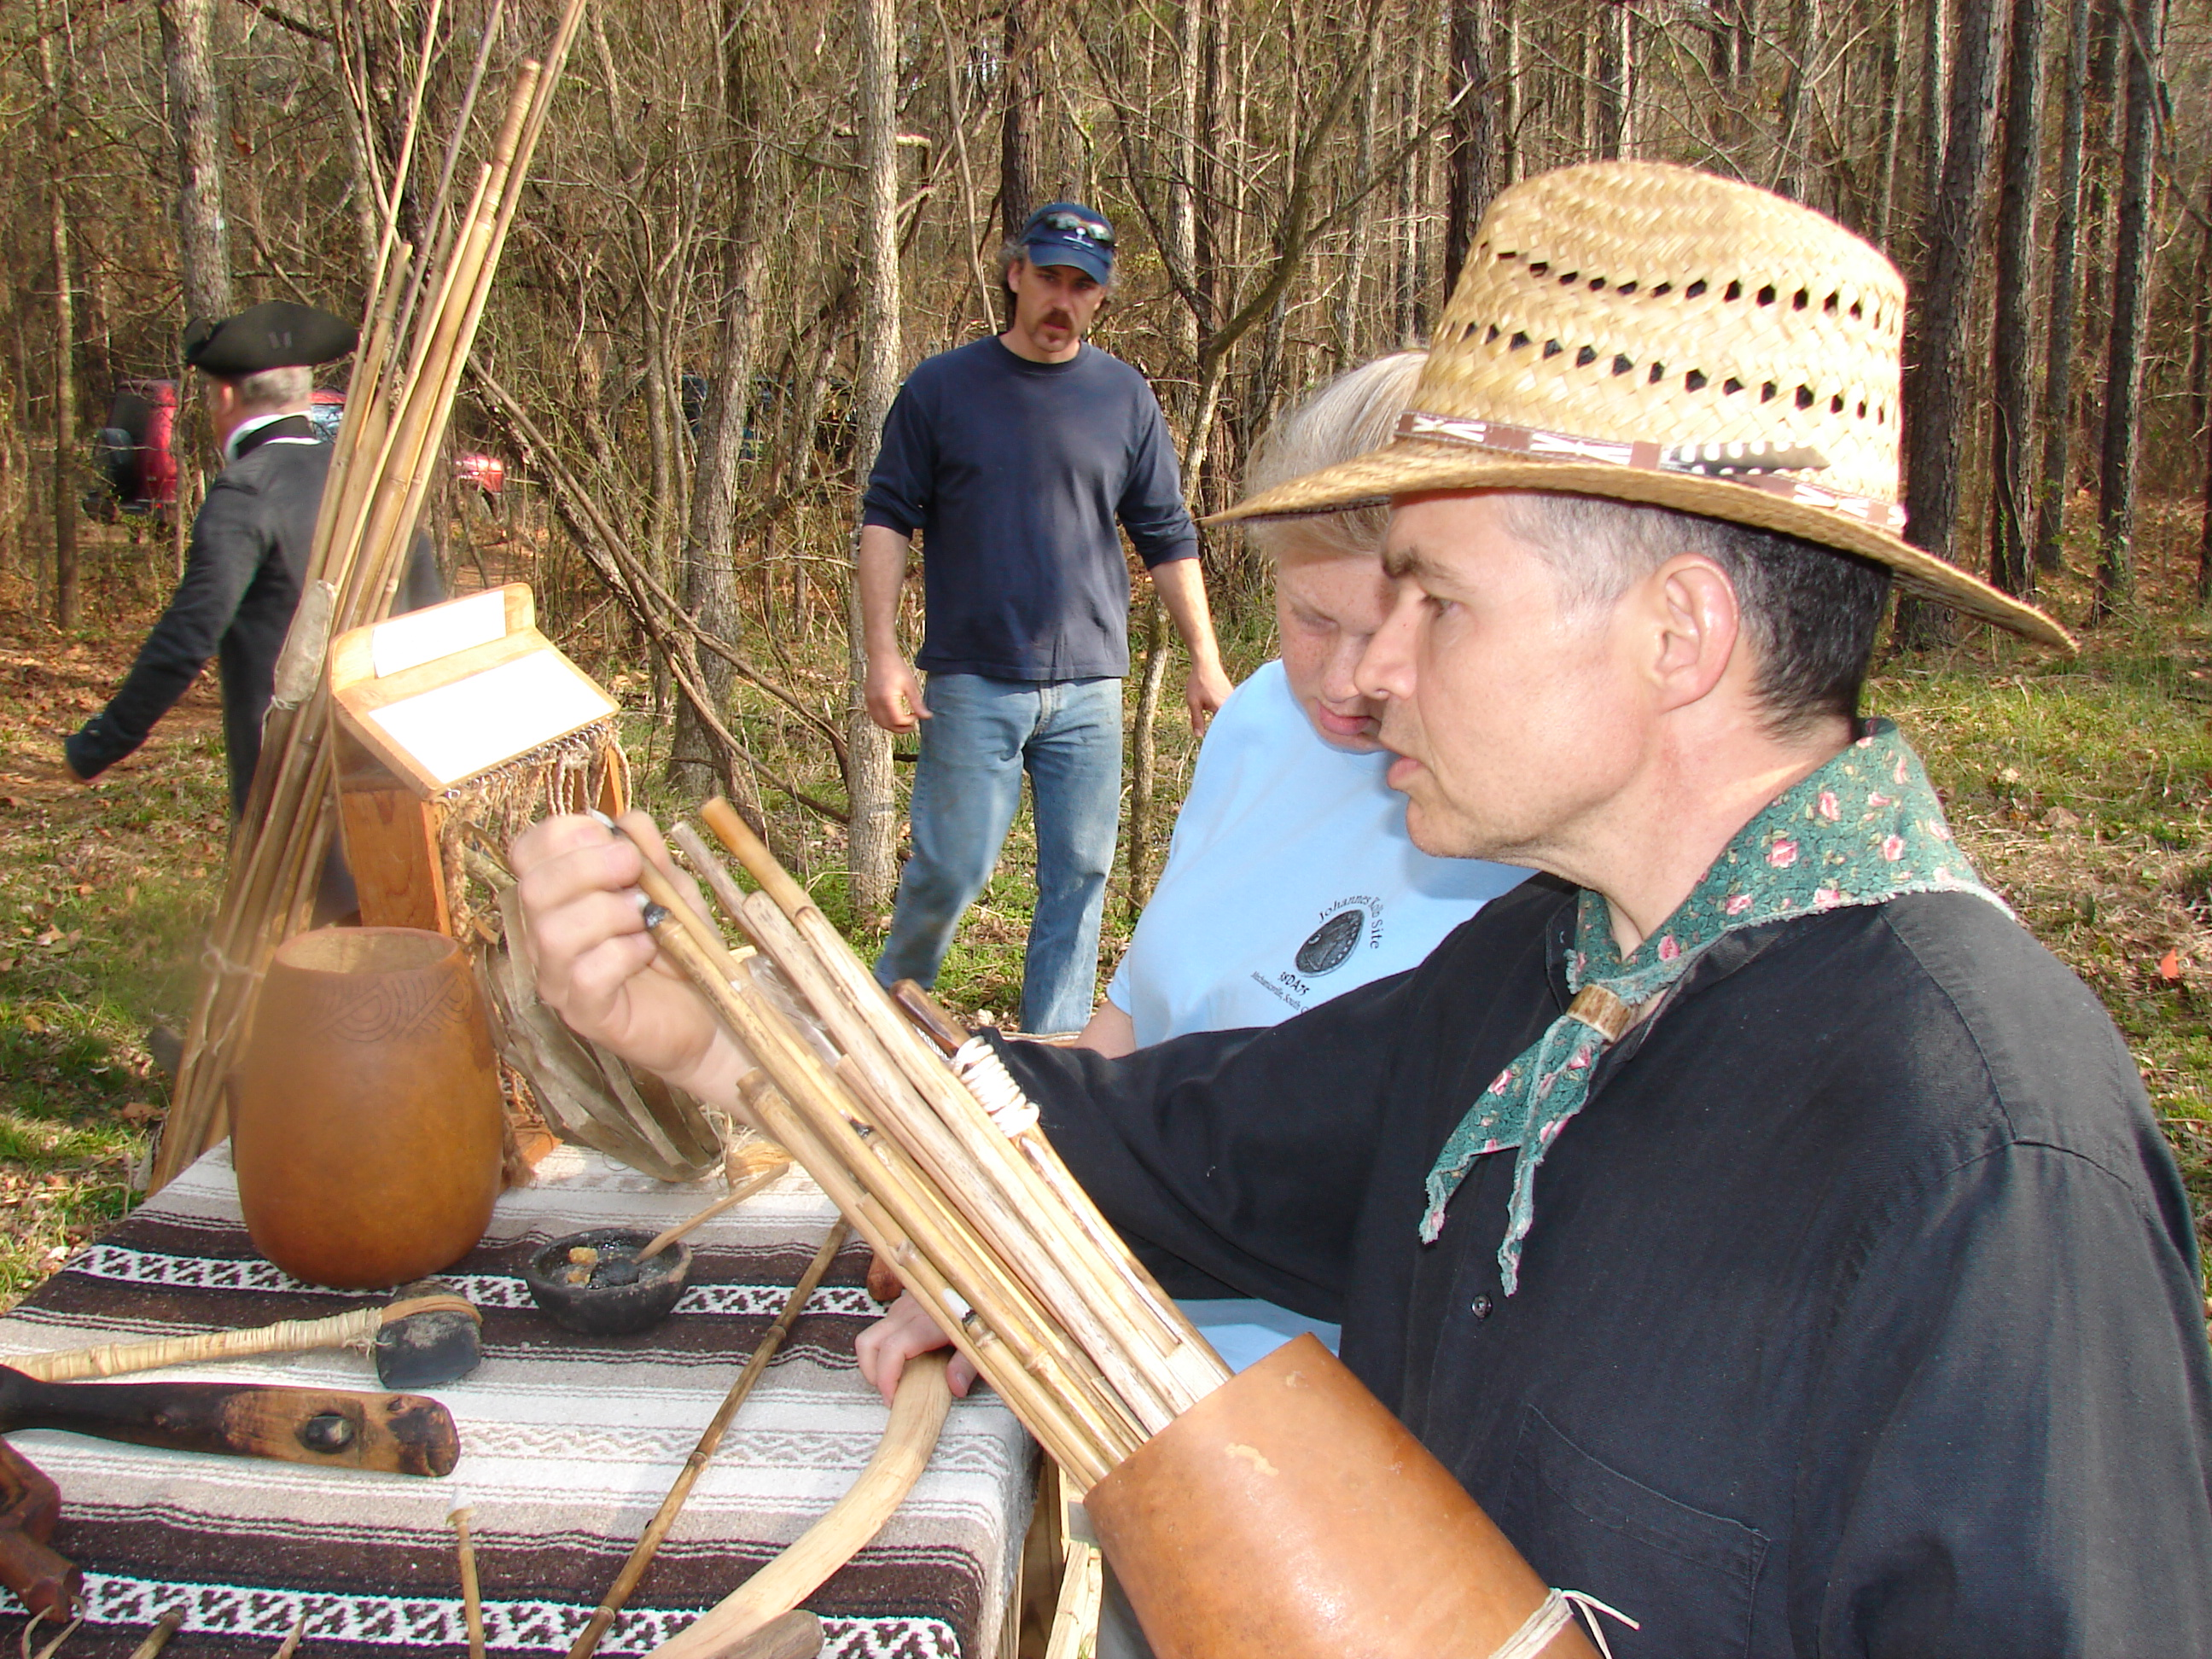 daltons woodworking